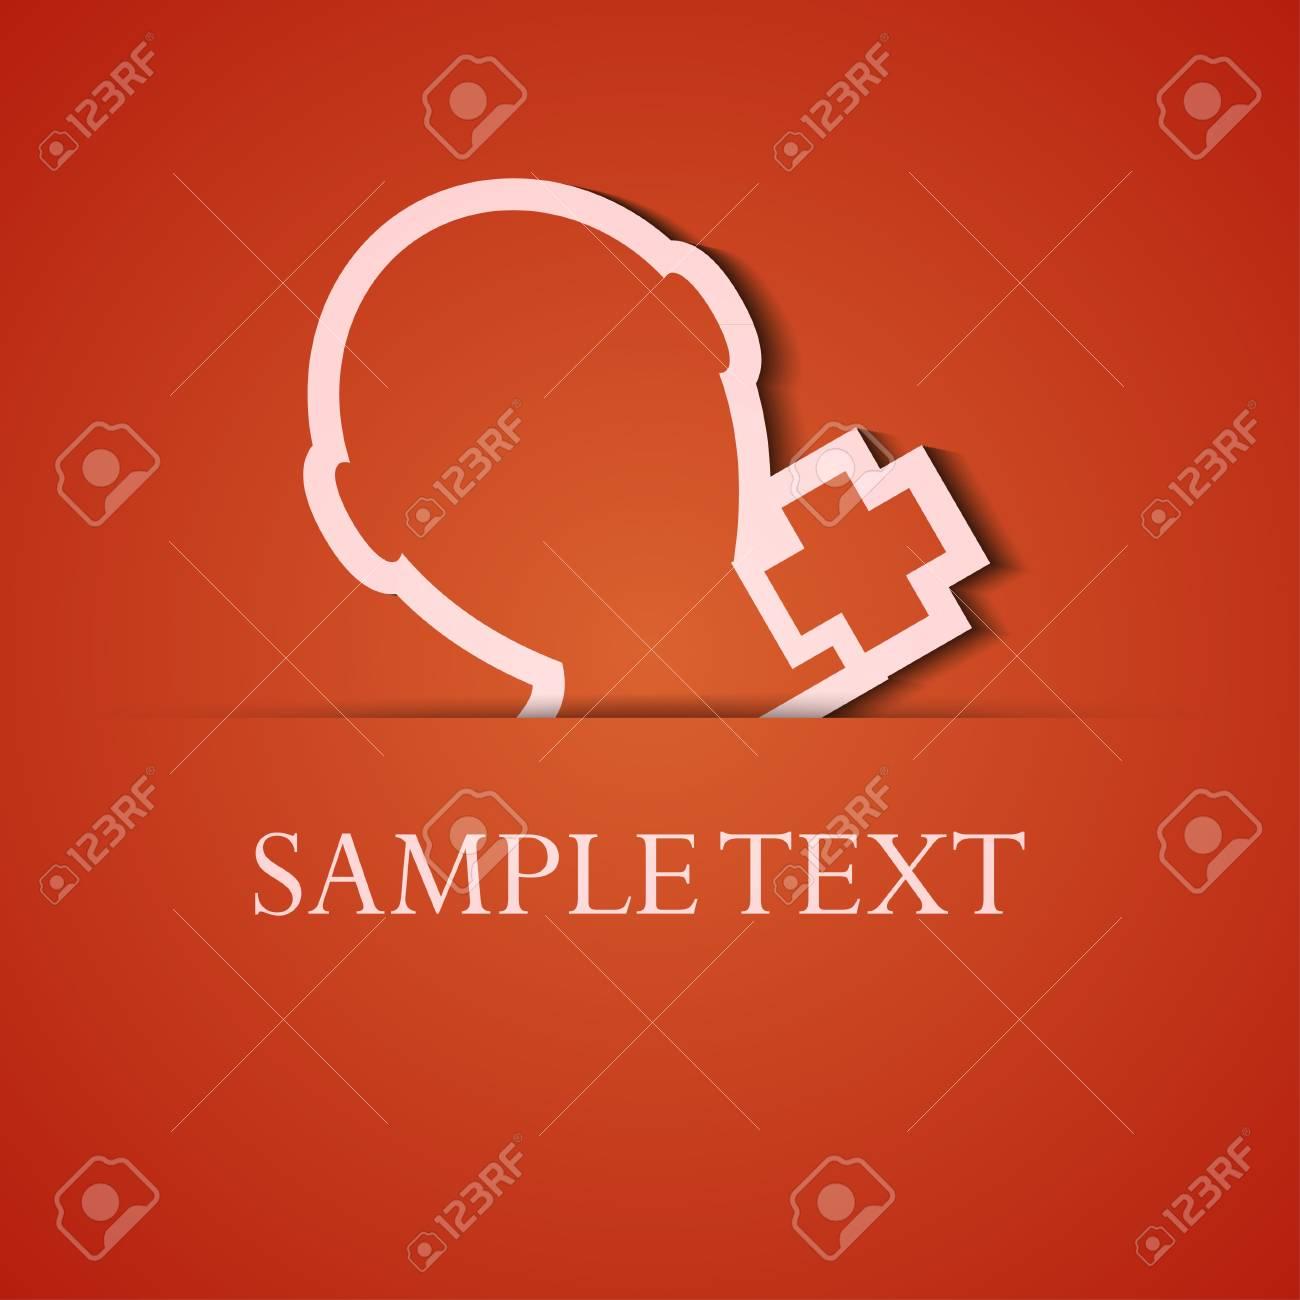 background. Orange icon applique. Stock Vector - 18073837